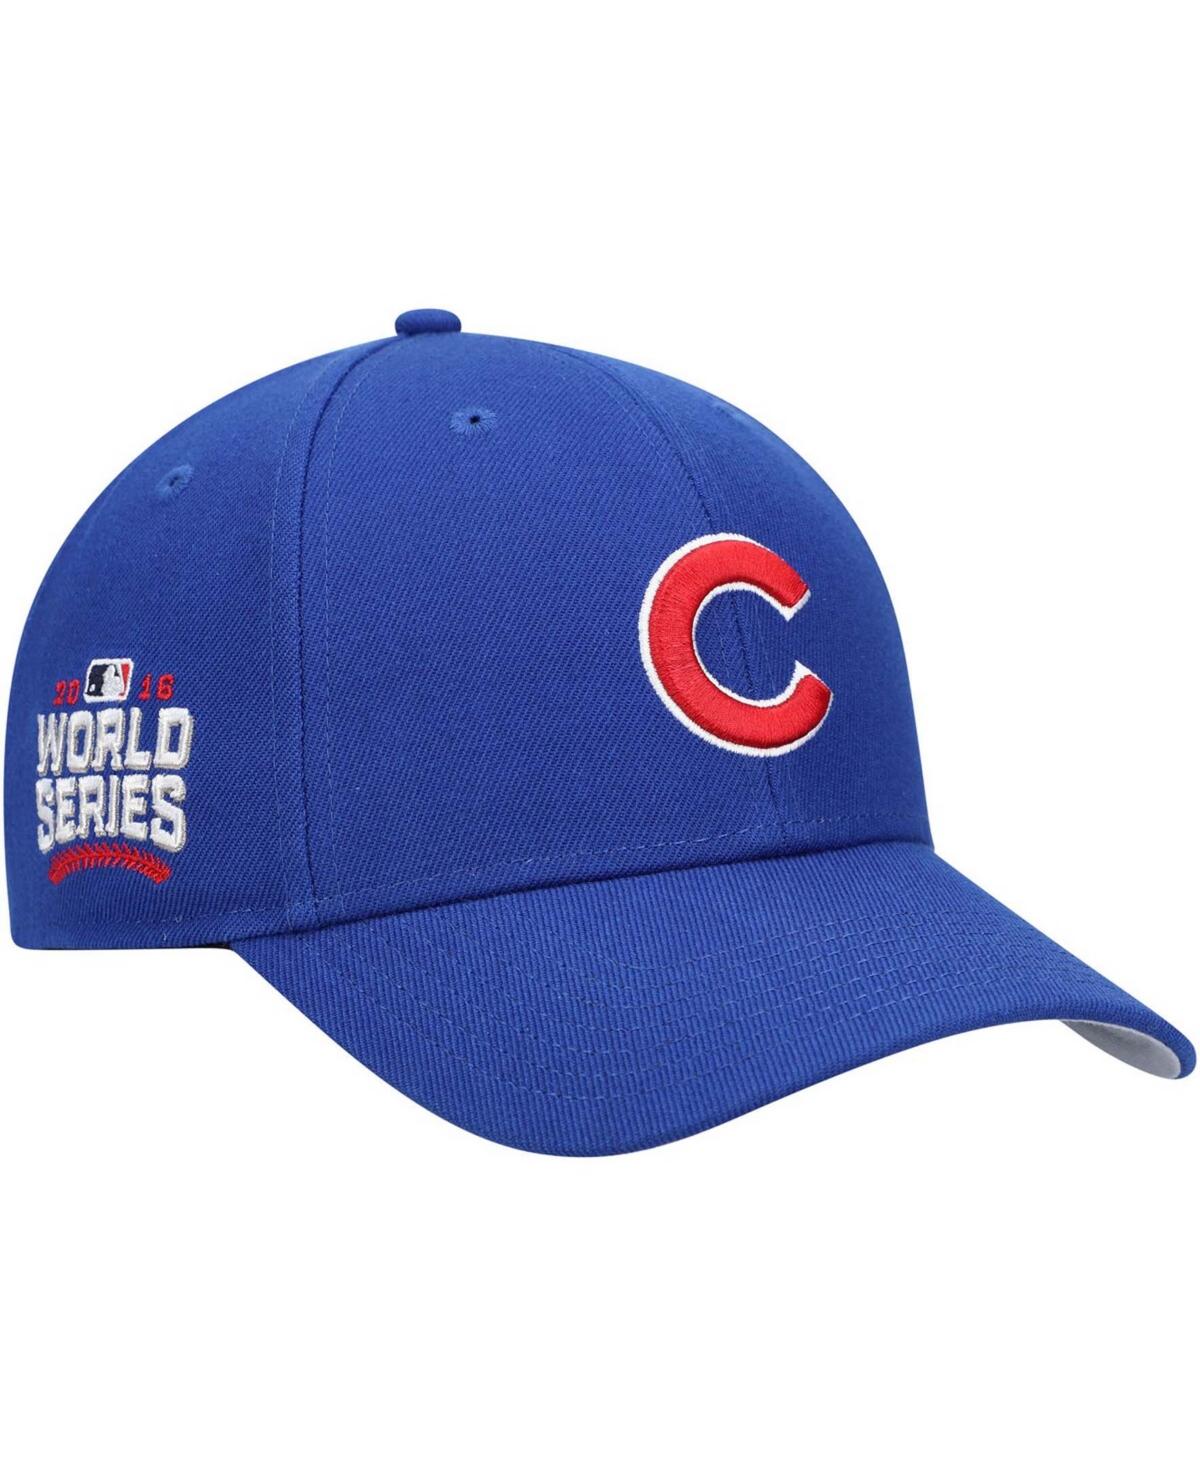 47 Brand Mens Royal Chicago Cubs 2016 World Series Sure Shot Mvp Snapback Cap